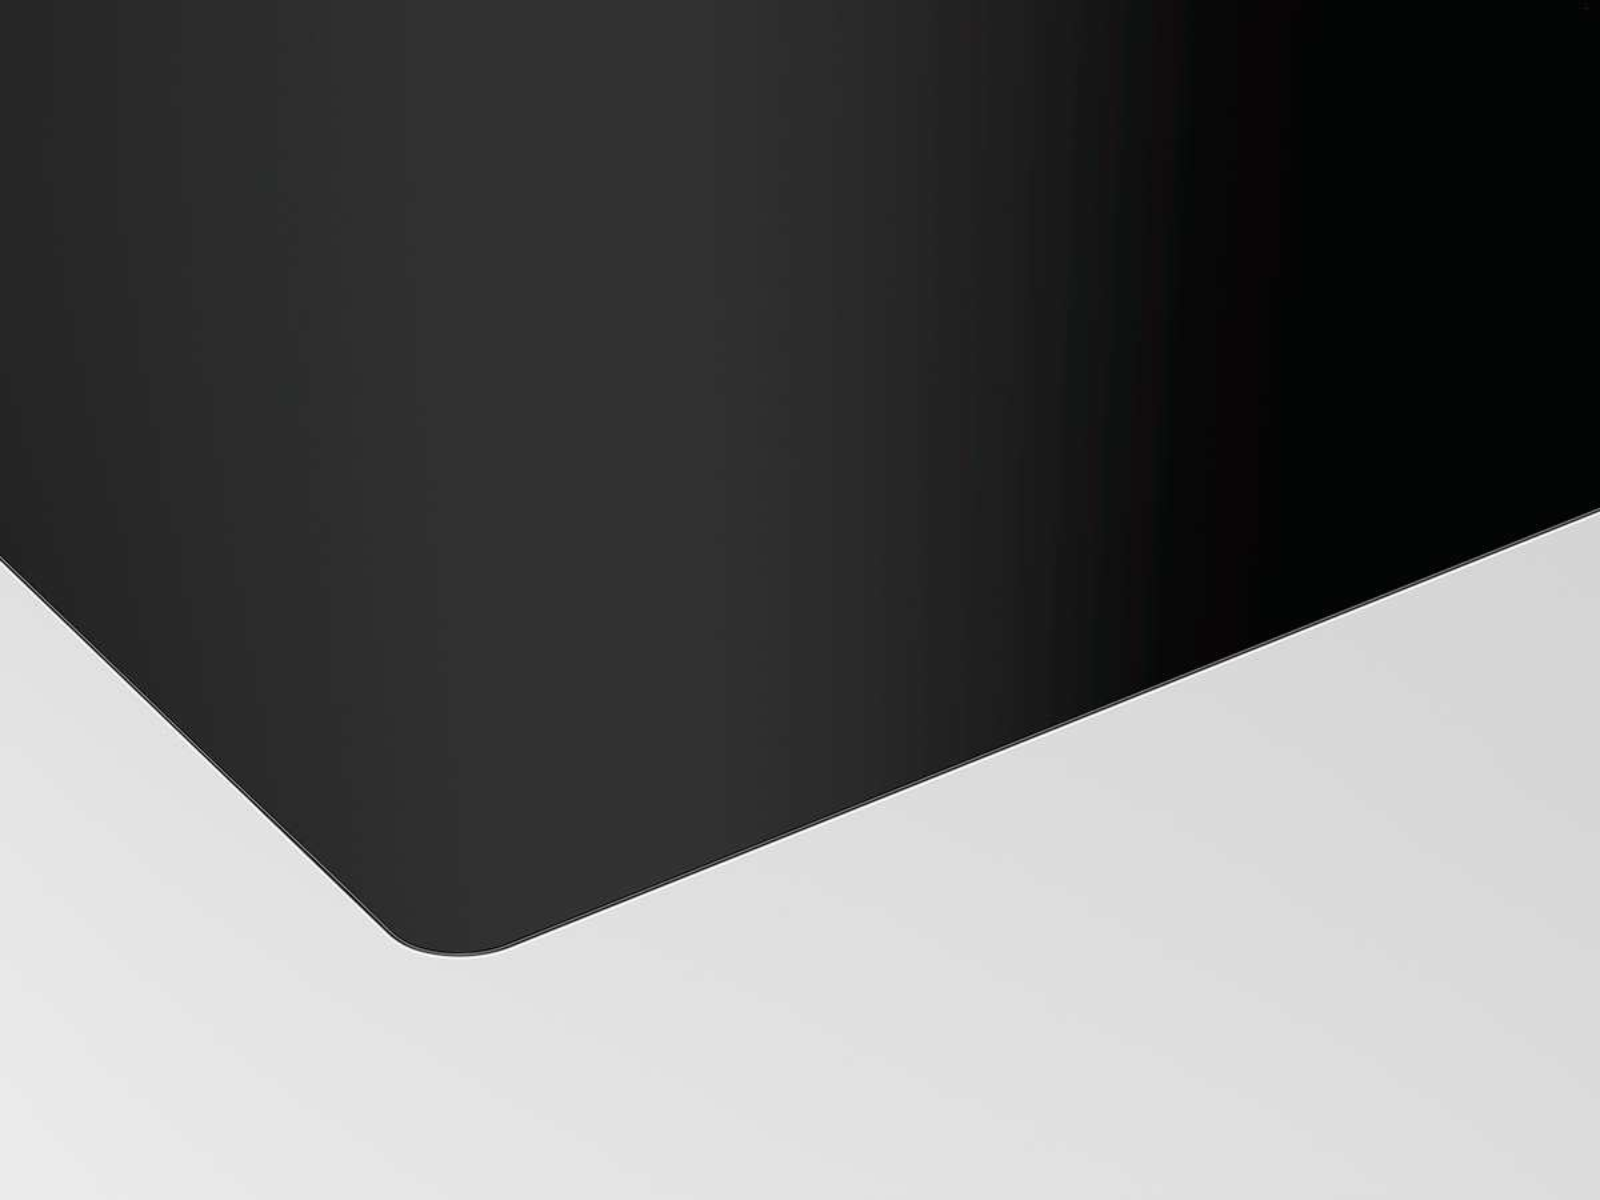 Kamin dunstabzugshaube schalter ciarra schwarze dunstabzugshaube